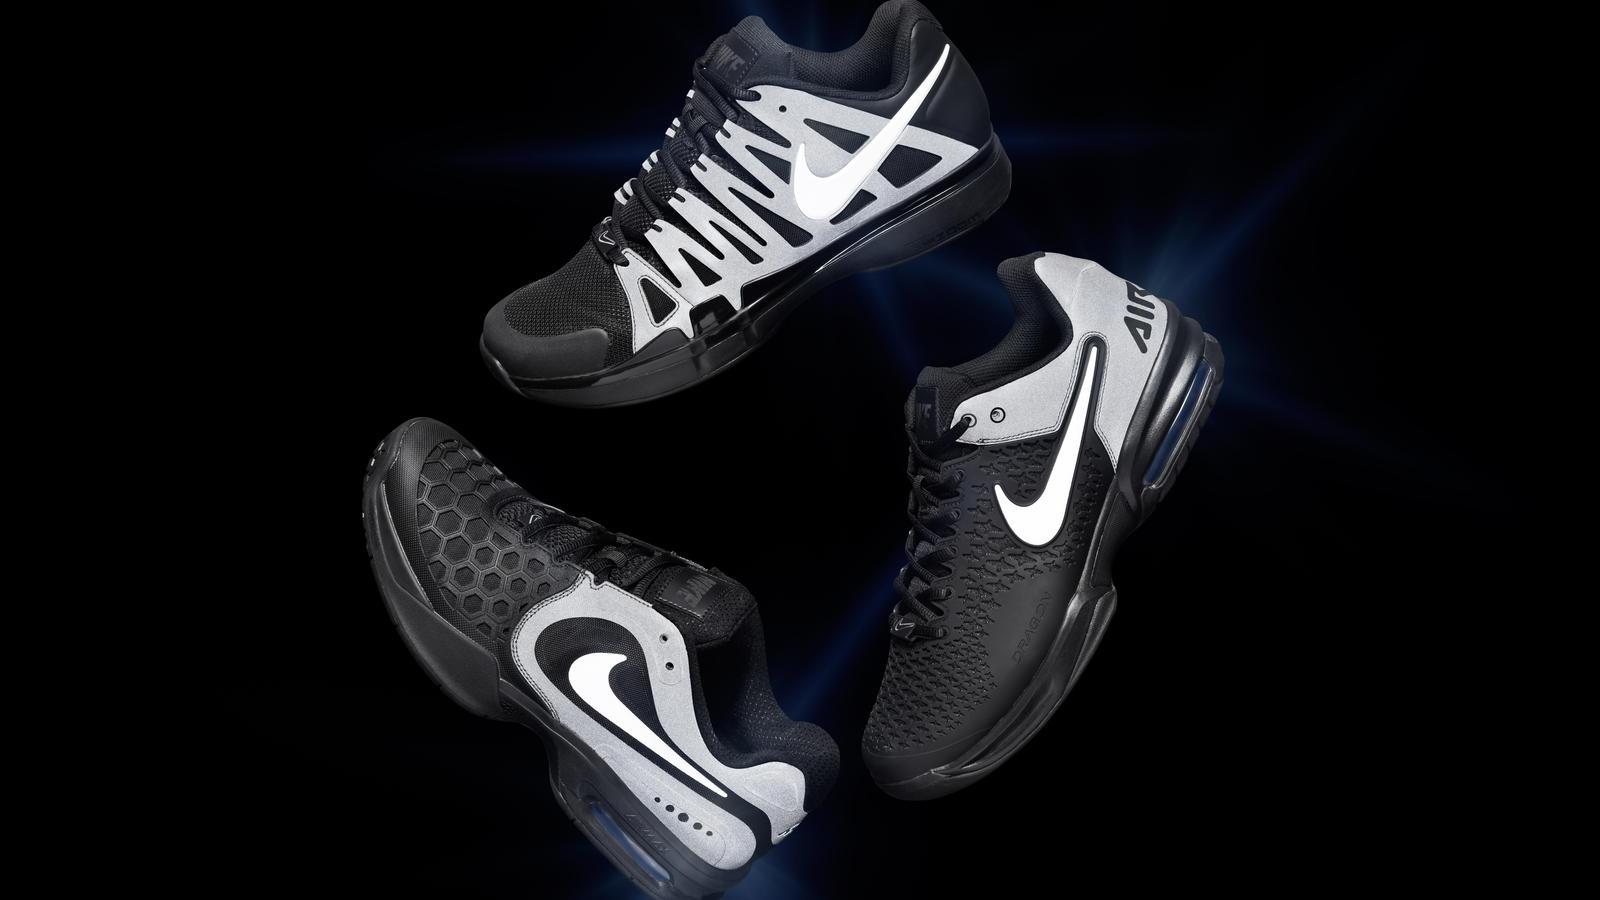 Nike Tennis Vapor Flash Shoe Group (with flash)